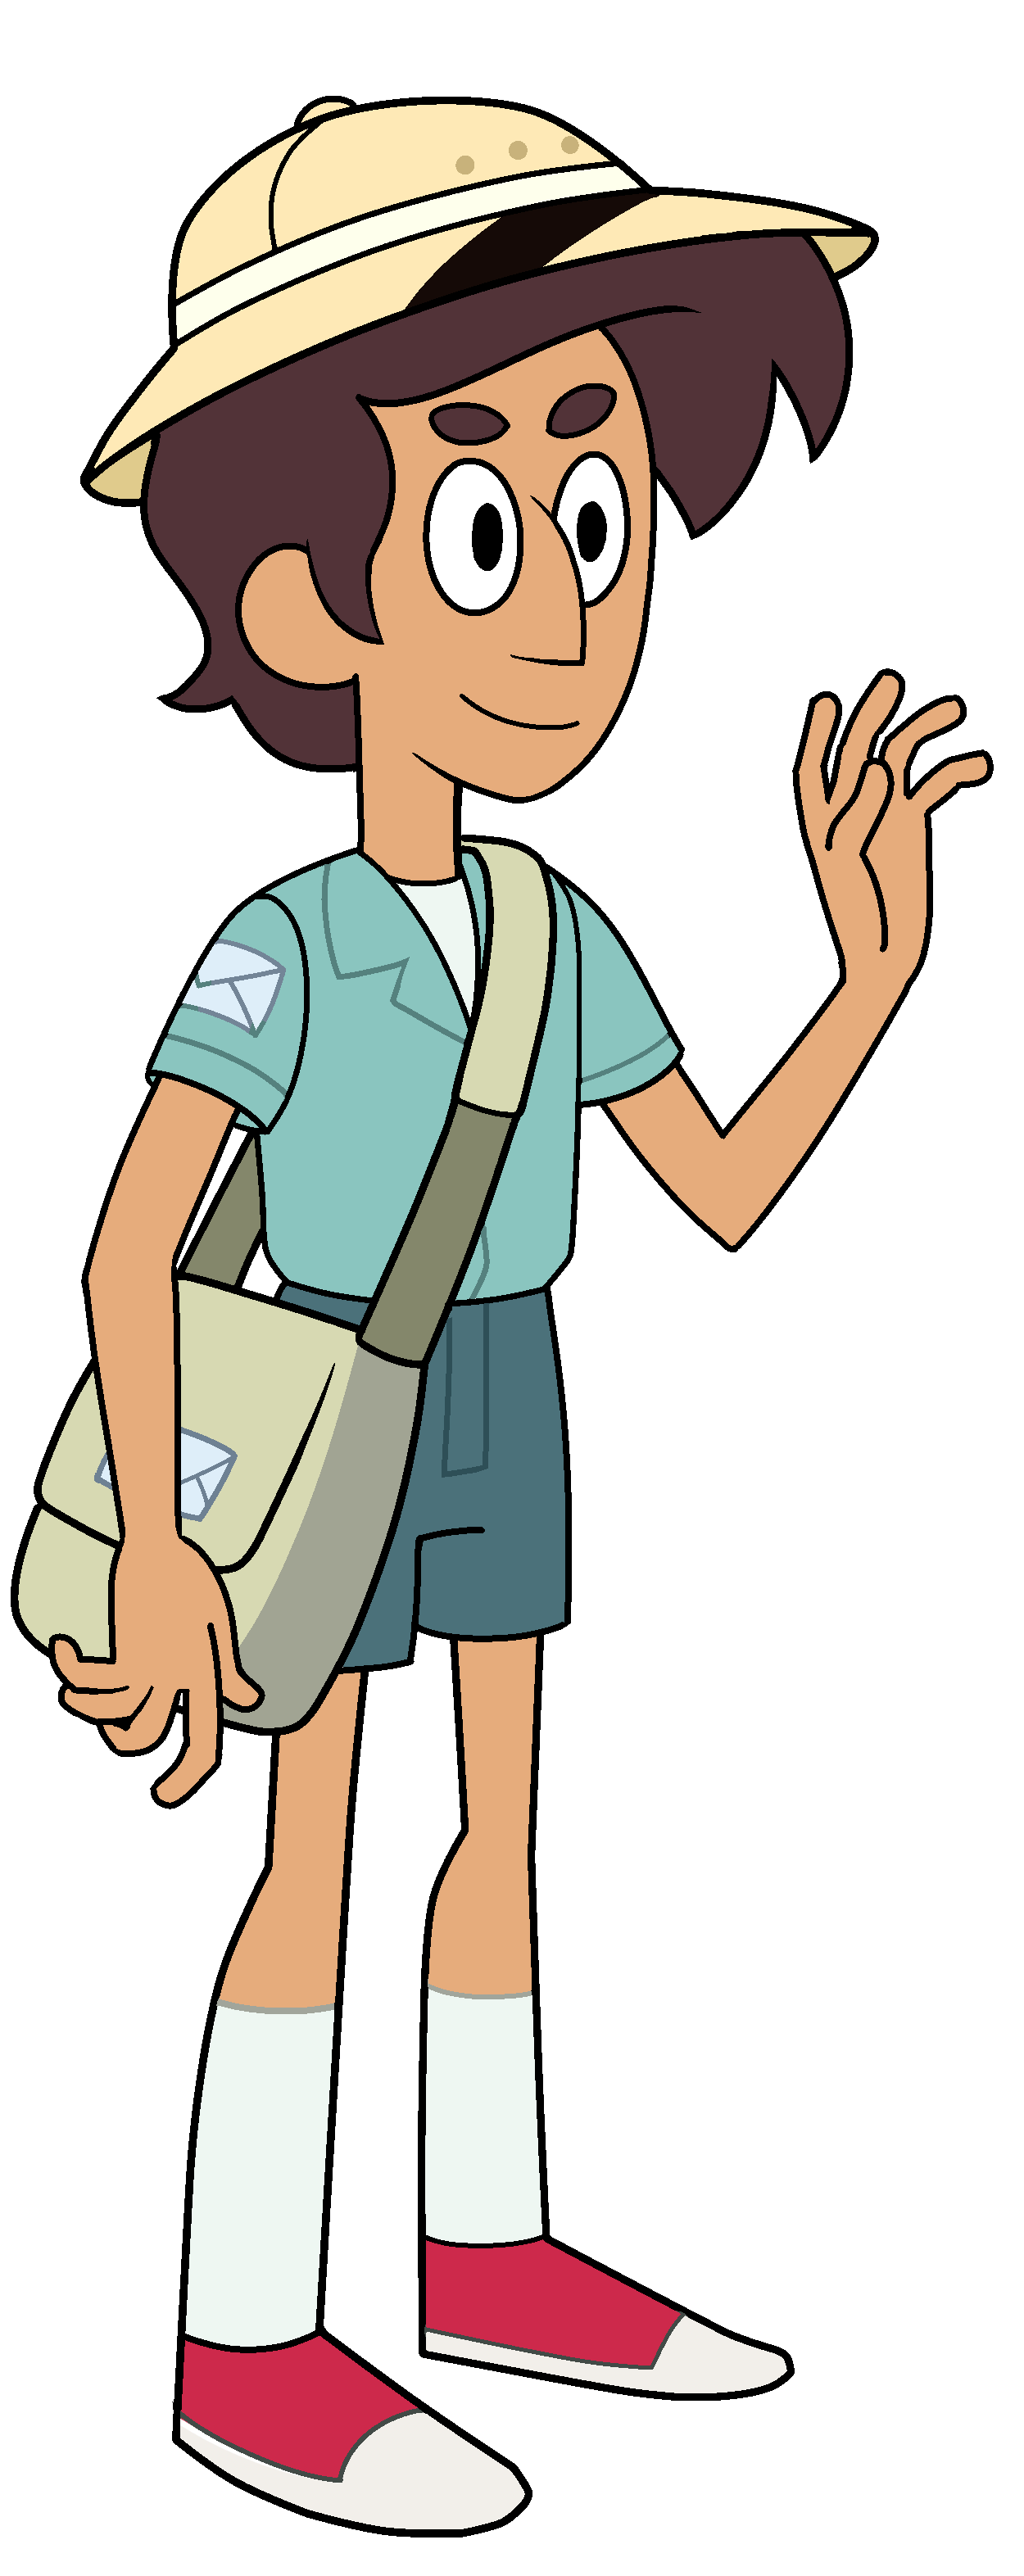 Mail clipart mail man. Jamie steven universe wiki